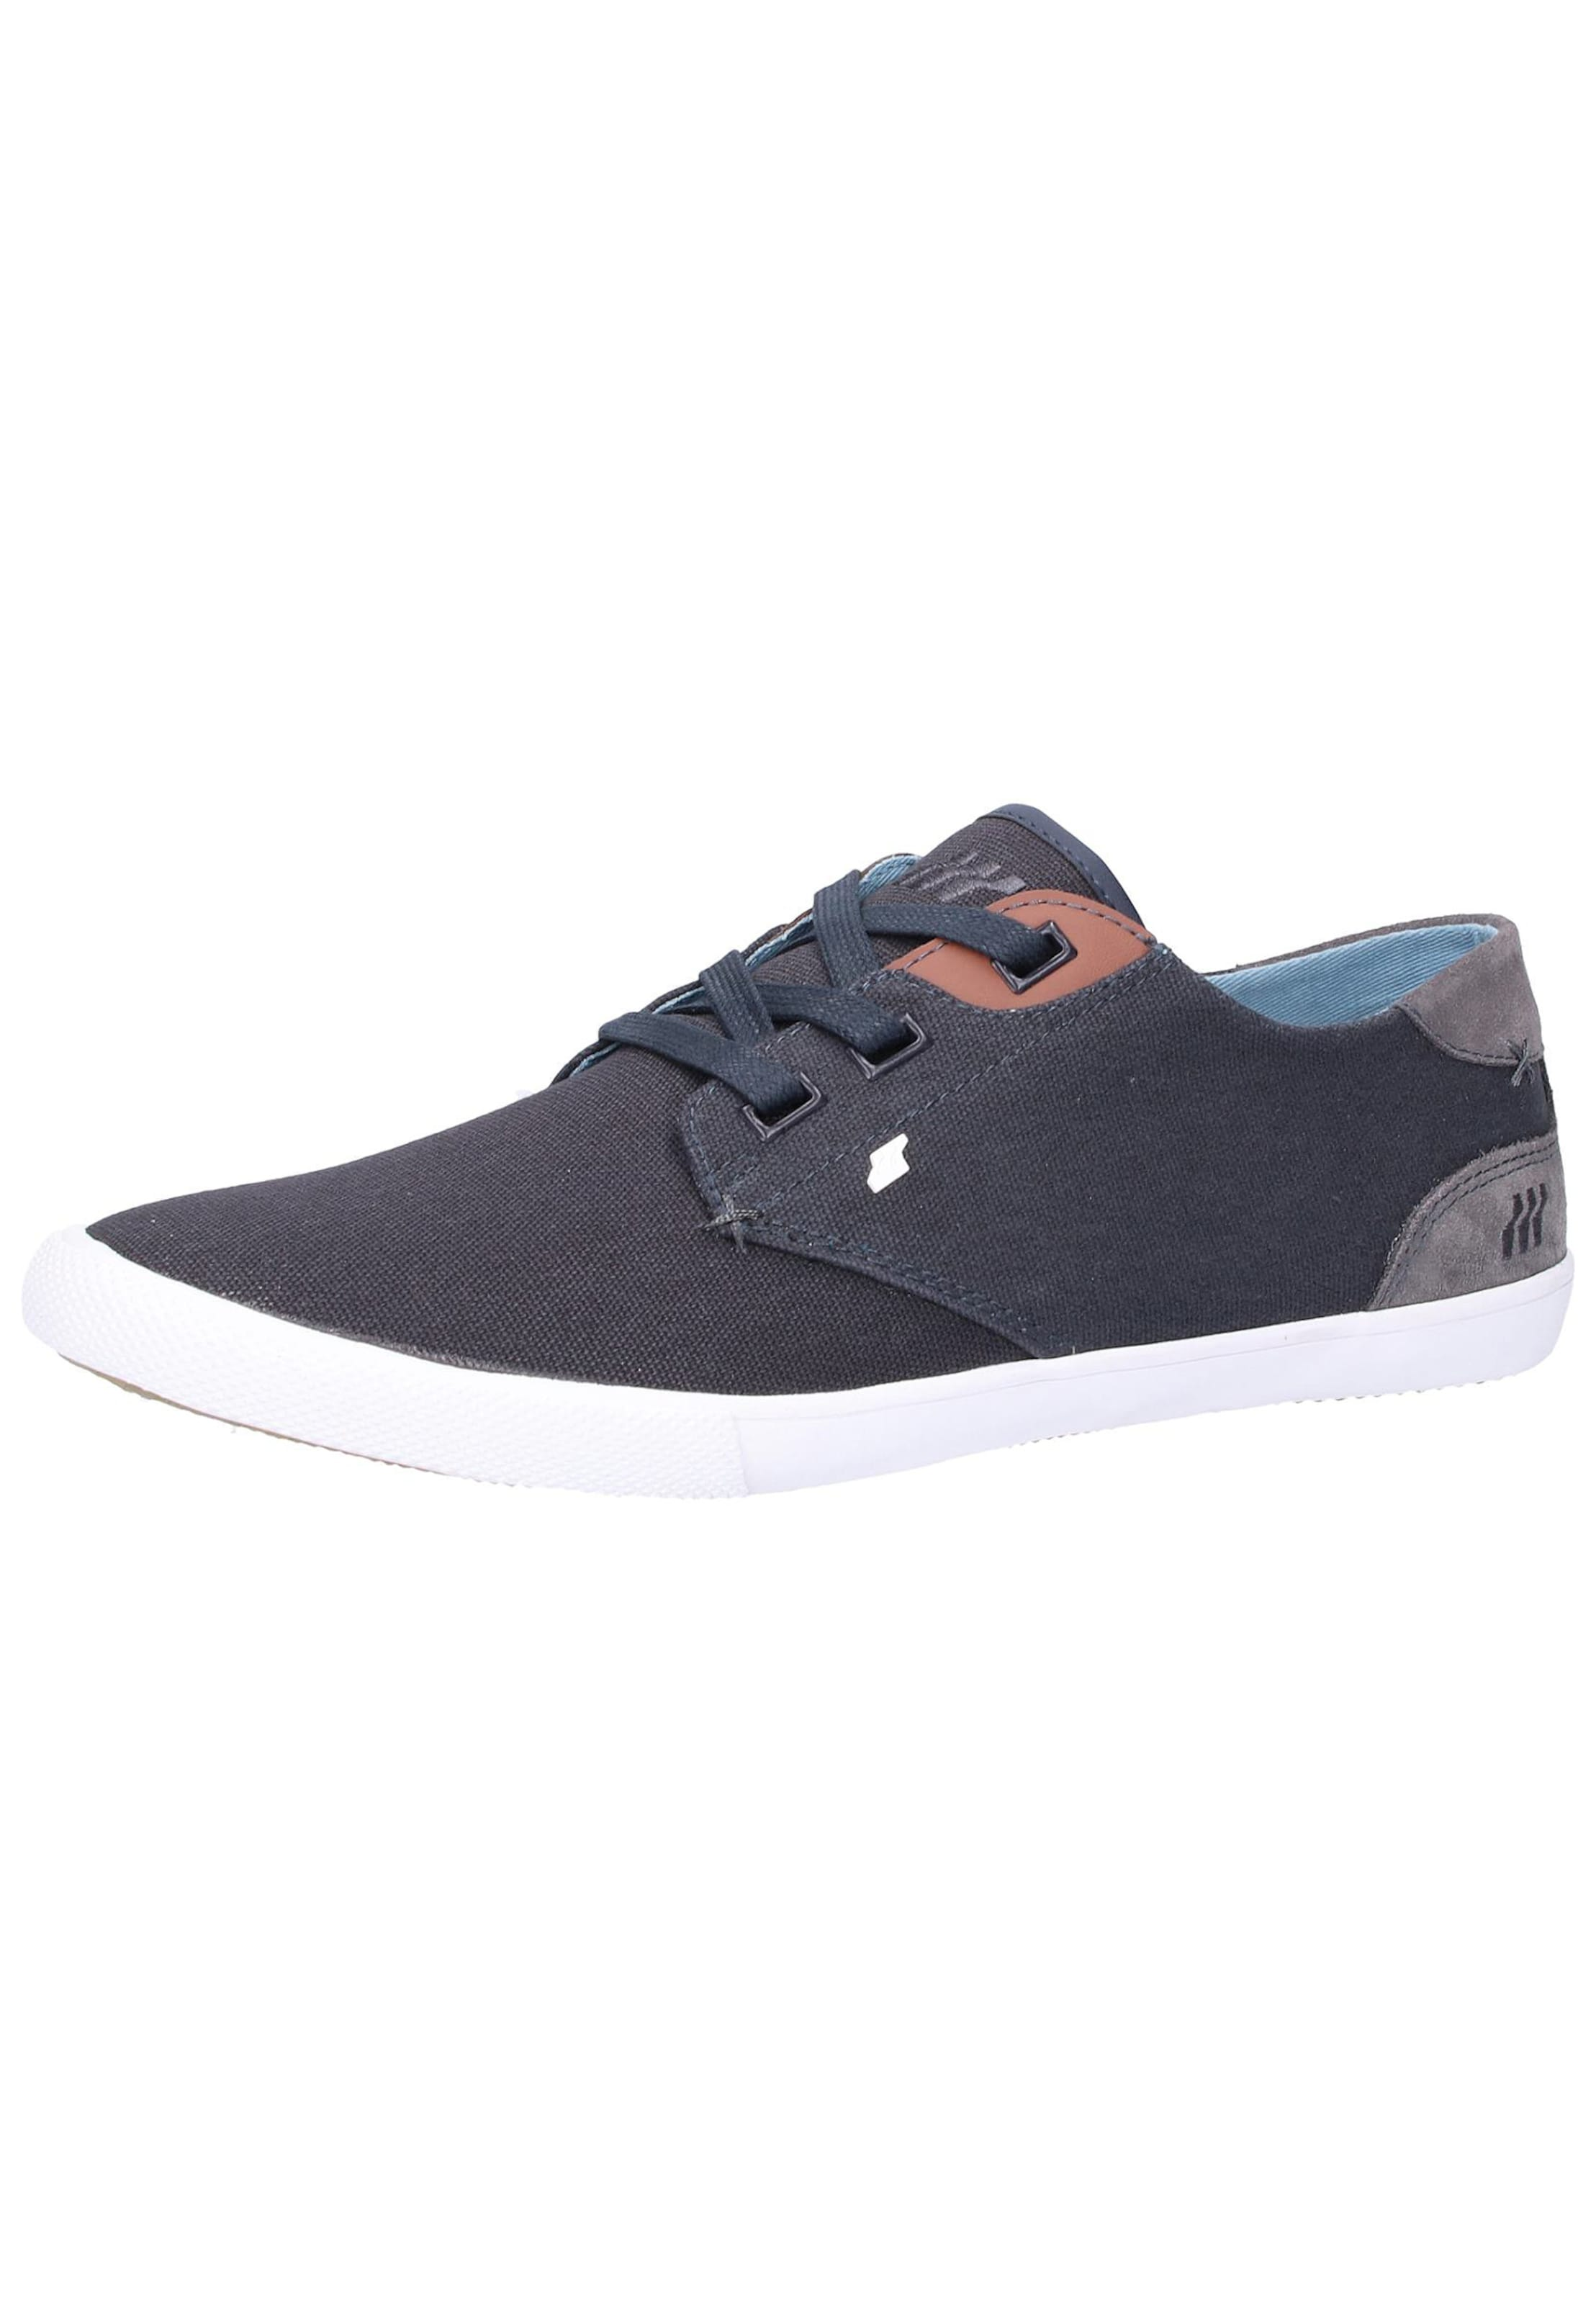 Sneaker Sneaker In Boxfresh Boxfresh In Navy Navy WEDIH2Ye9